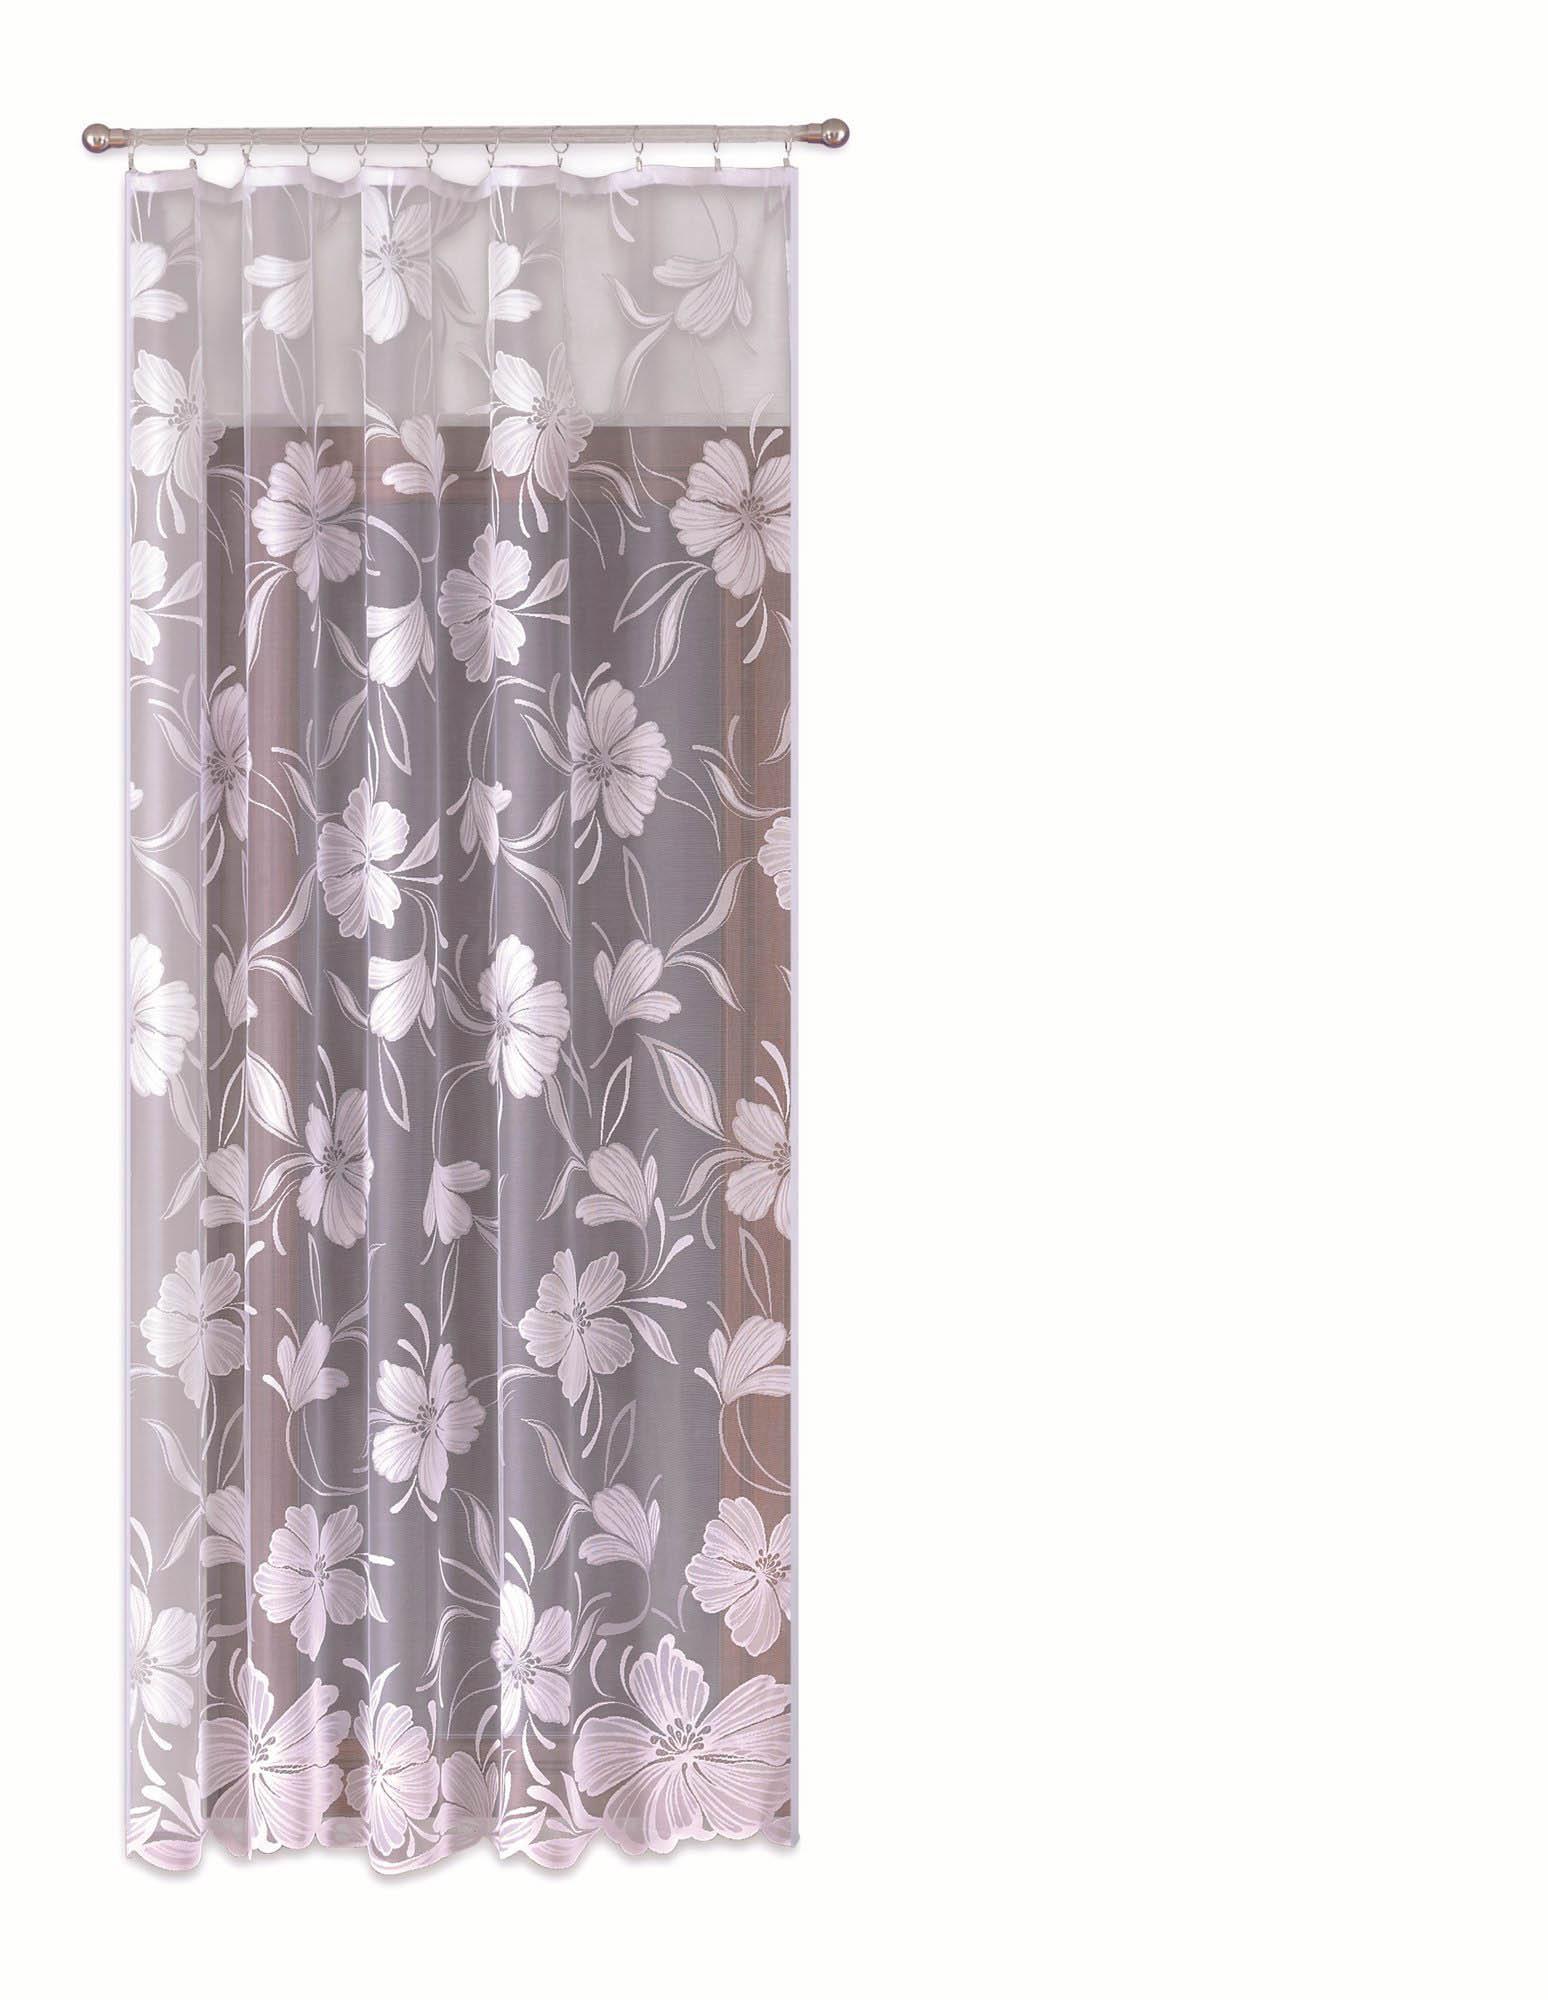 Шторы Primavera Классические шторы Elly Цвет: Белый шторы kauffort классические шторы barolo